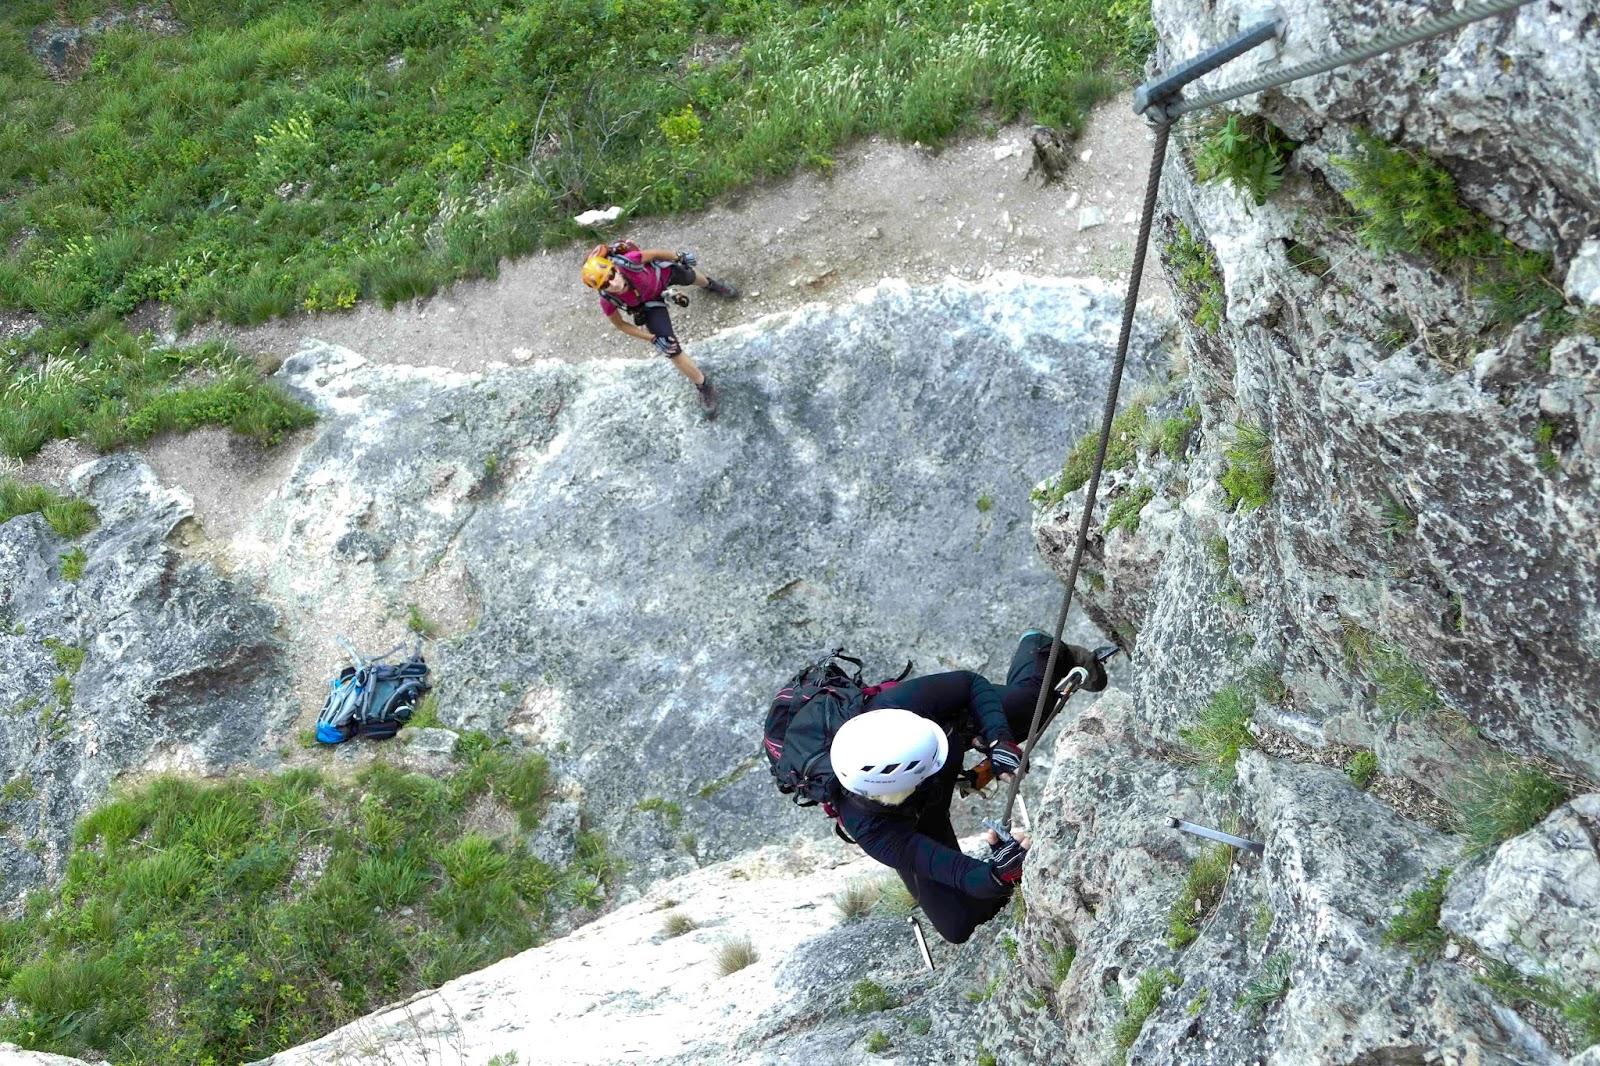 Pittentaler Klettersteig : Mało za duże podróże: via ferrata austria pittentaler klettersteig